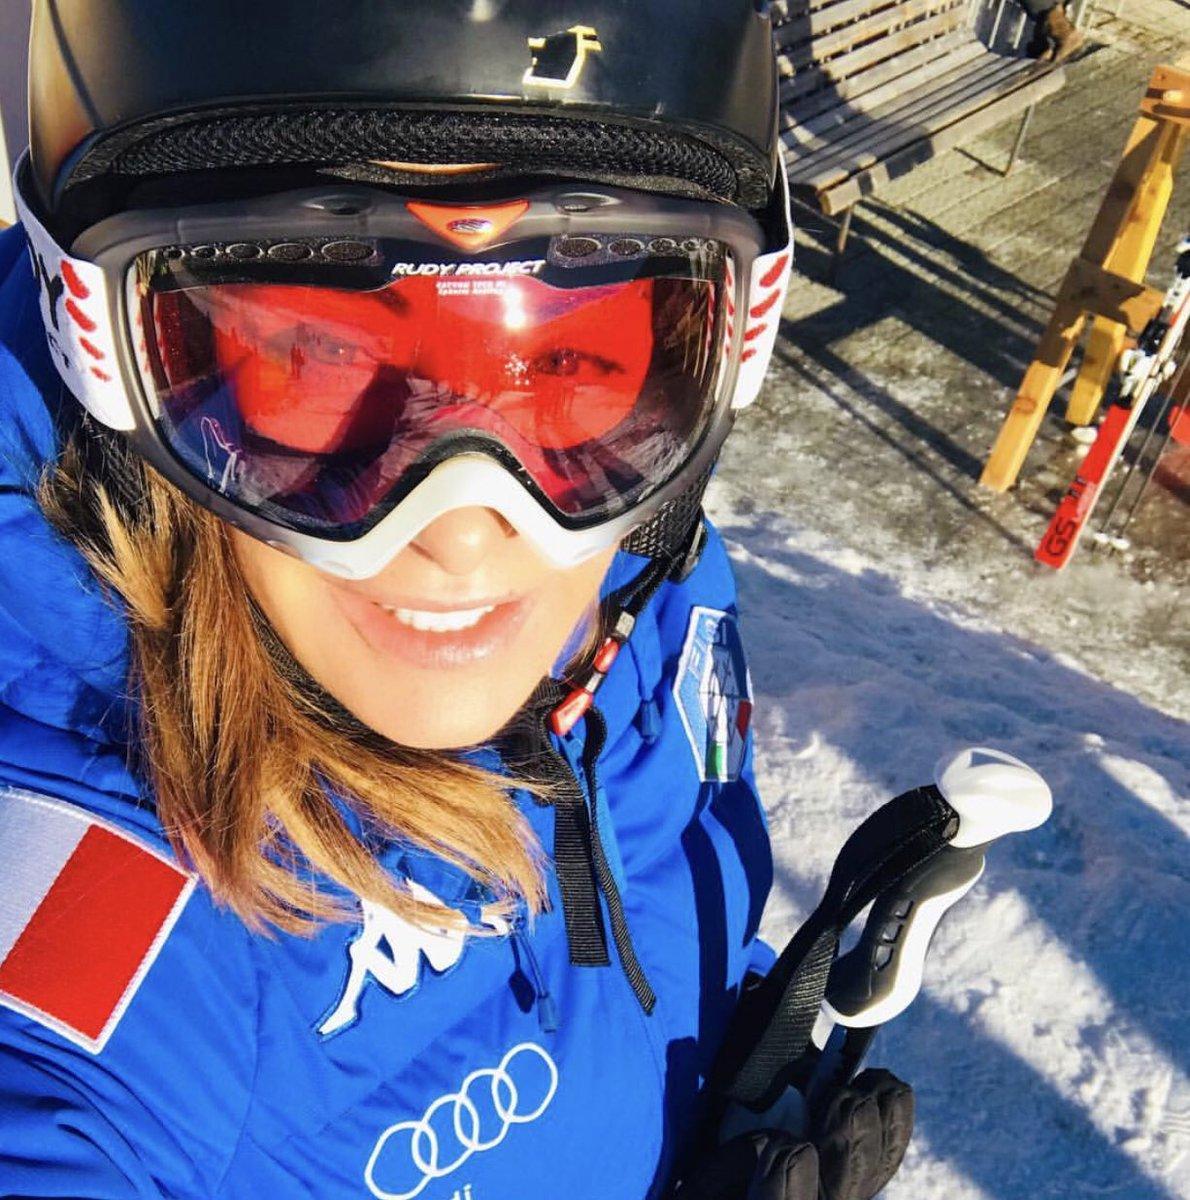 What a sunny day !! #sunnyday #mountains #snow #sabrinasalerno #holiday ☃️❄️ https://t.co/KfTXtcGbSX